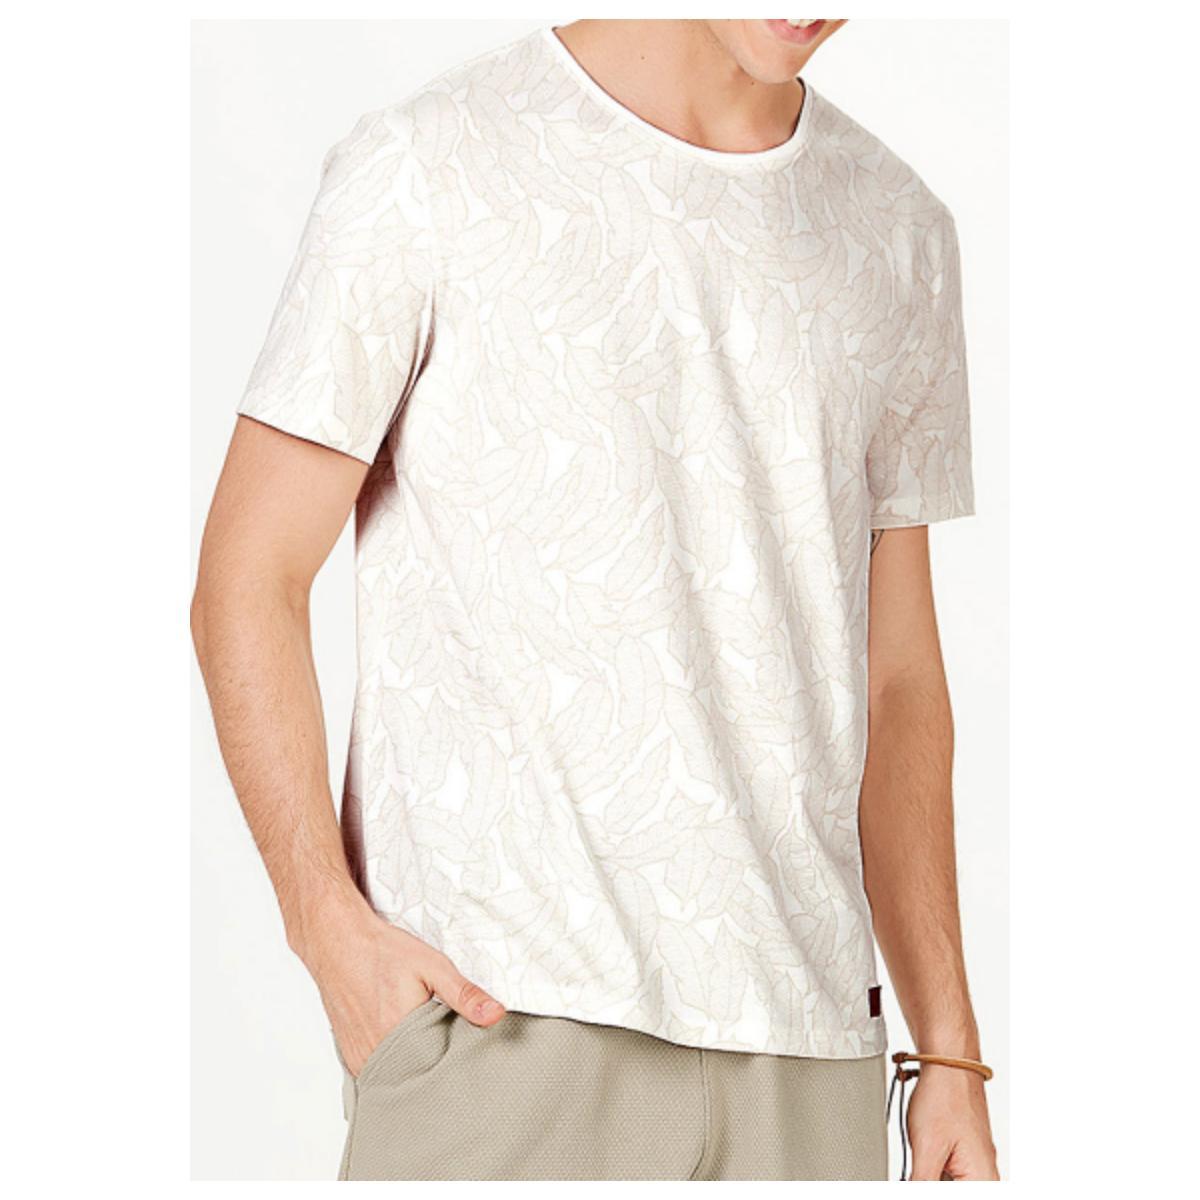 Camiseta Masculina Hering 4efk 3gen Nude